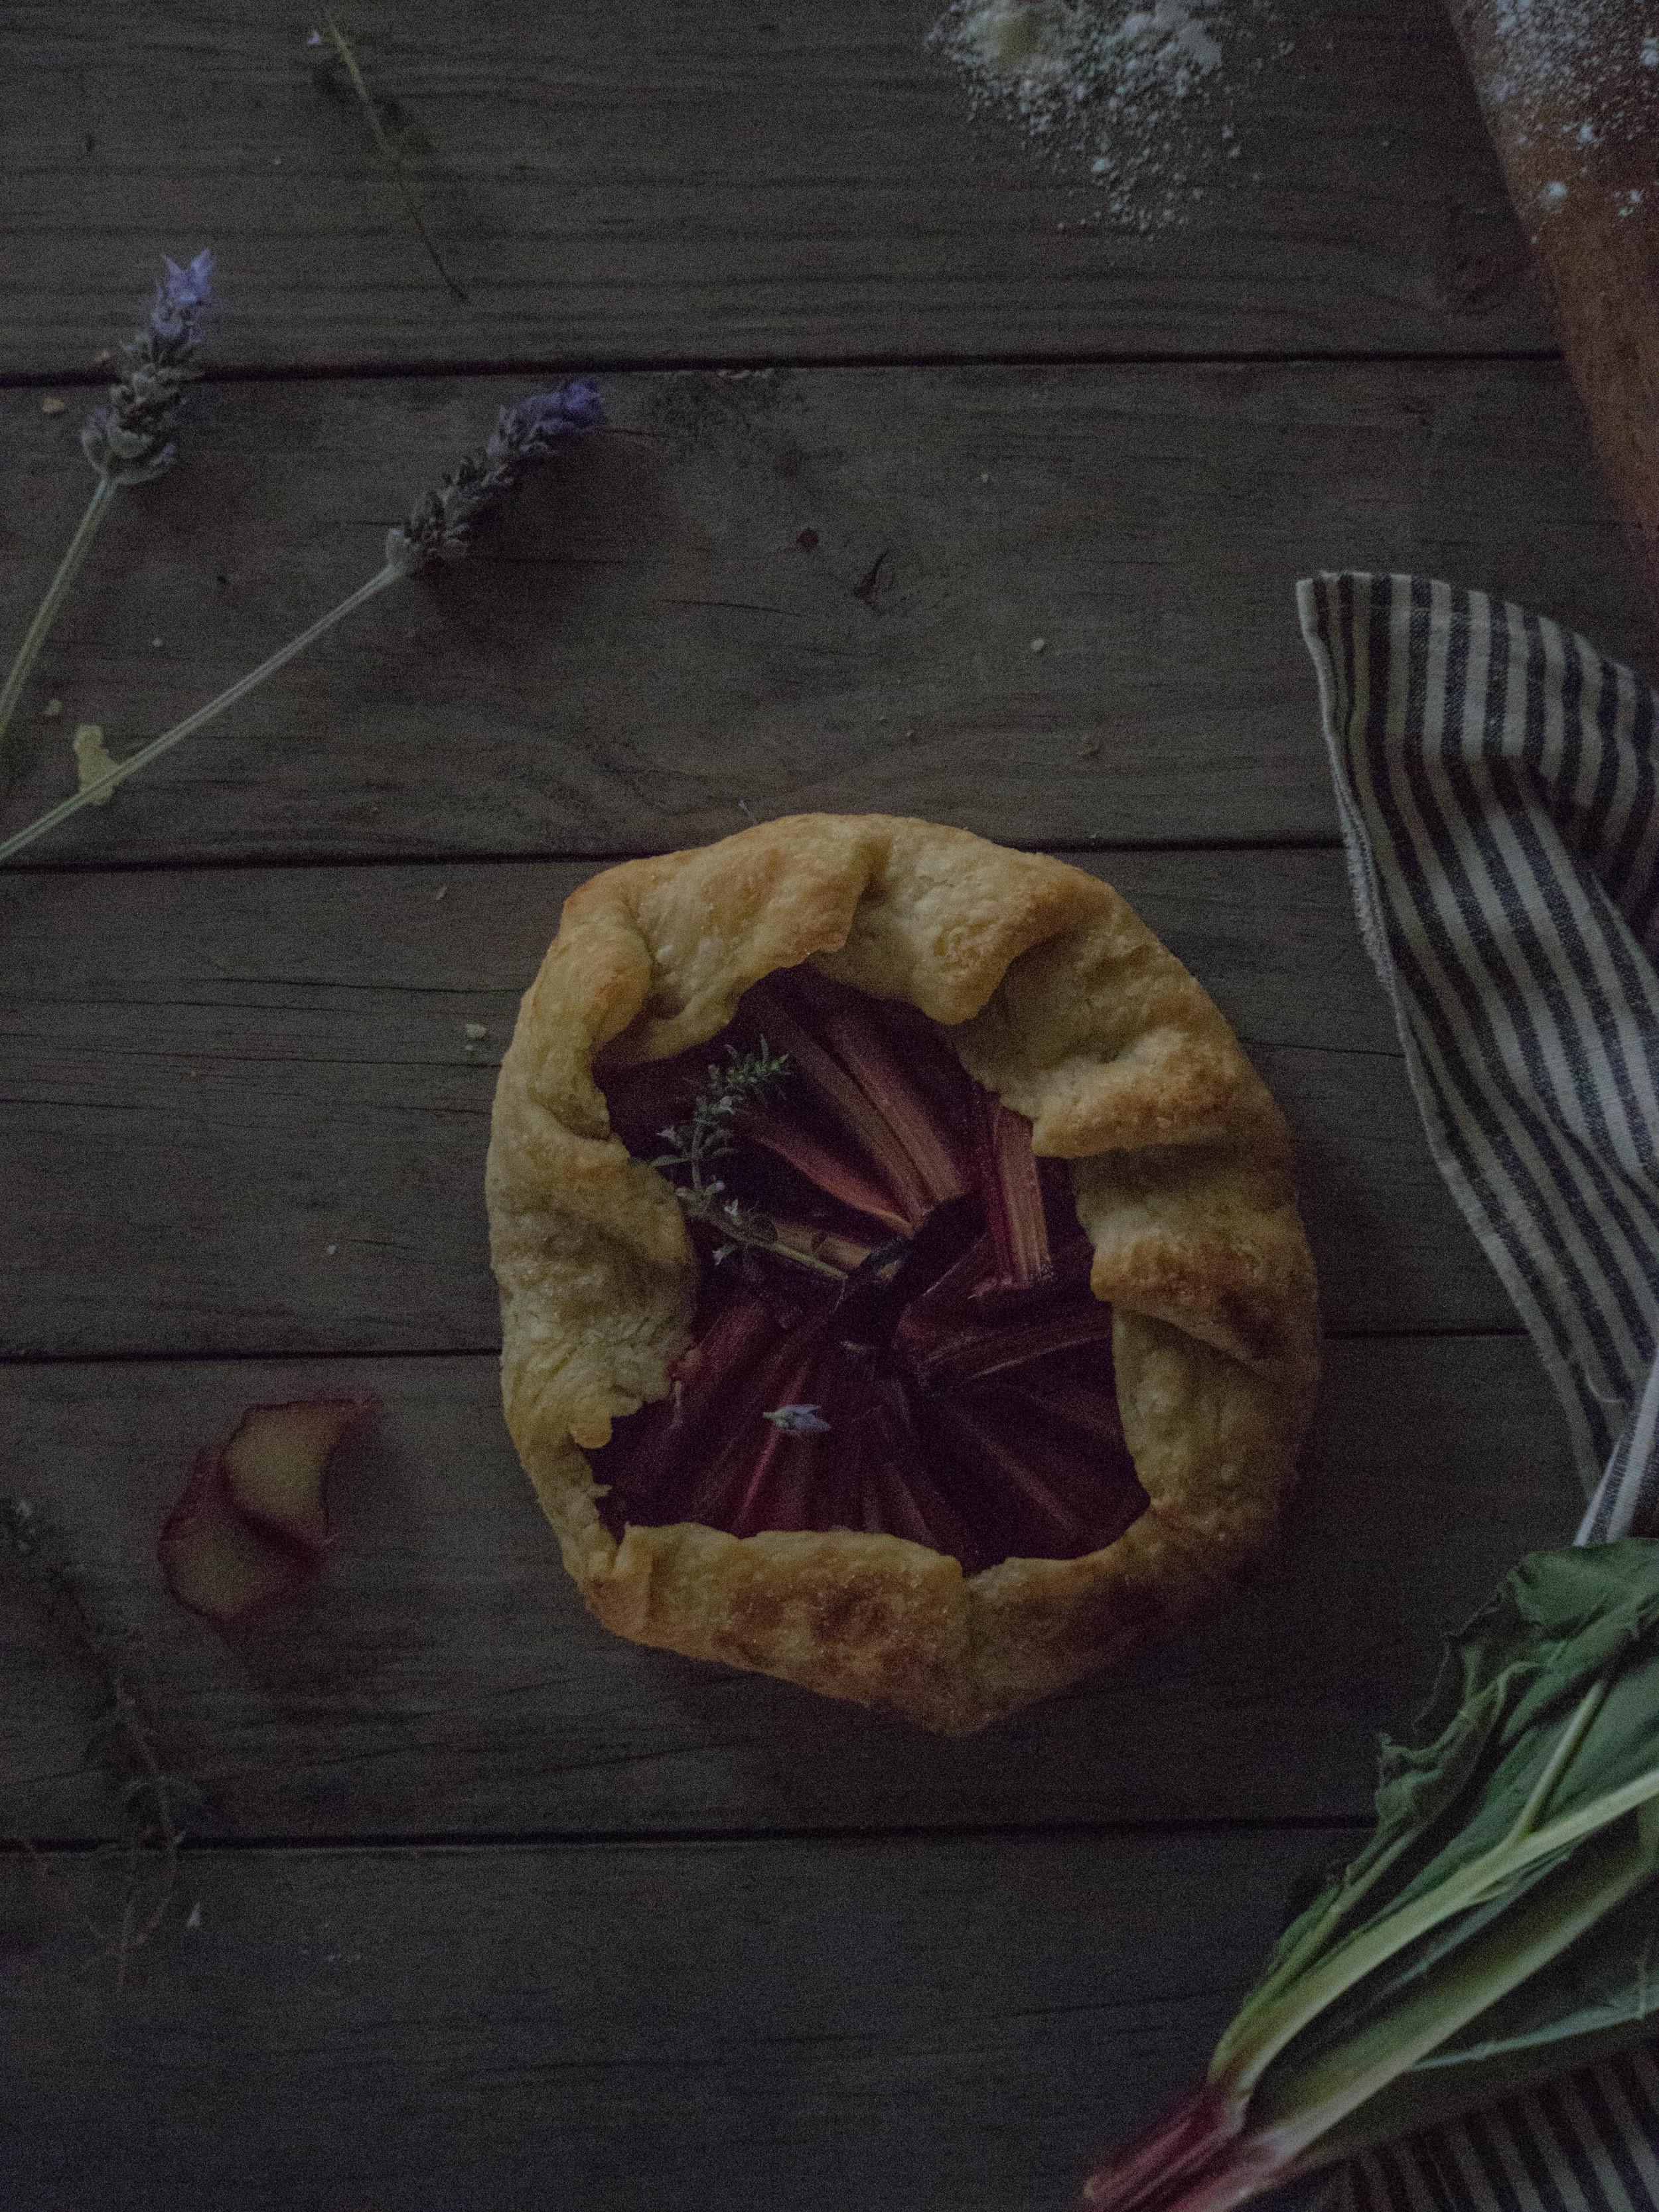 Slow Living Workshop Rhubarb Galette - Kulinary Adventures of Kath